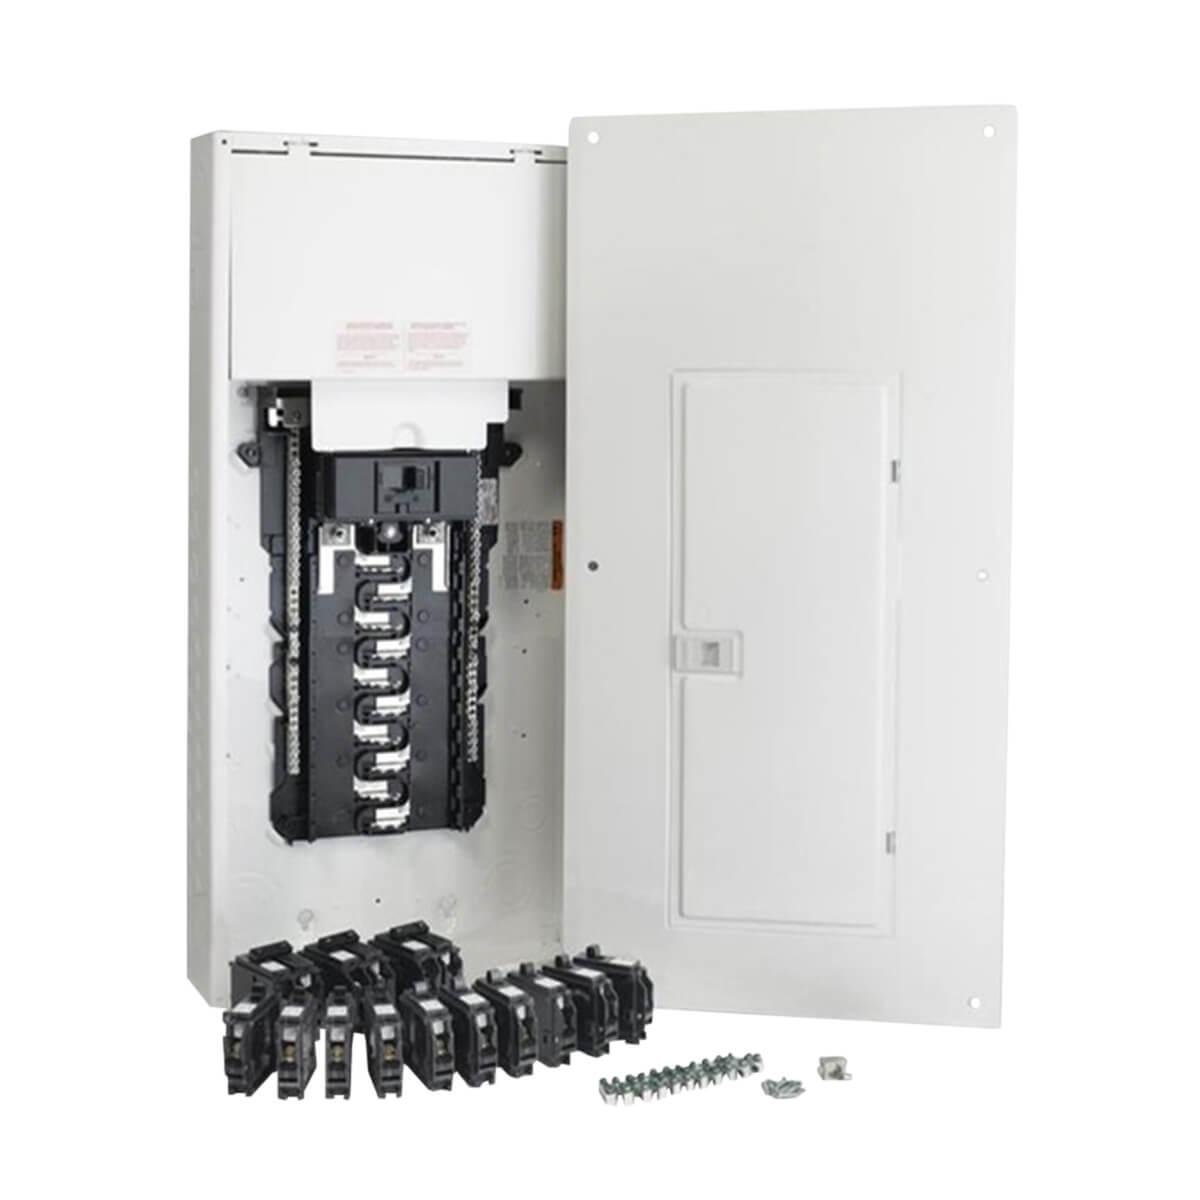 200A 40-Circuit Main Breaker Load Center